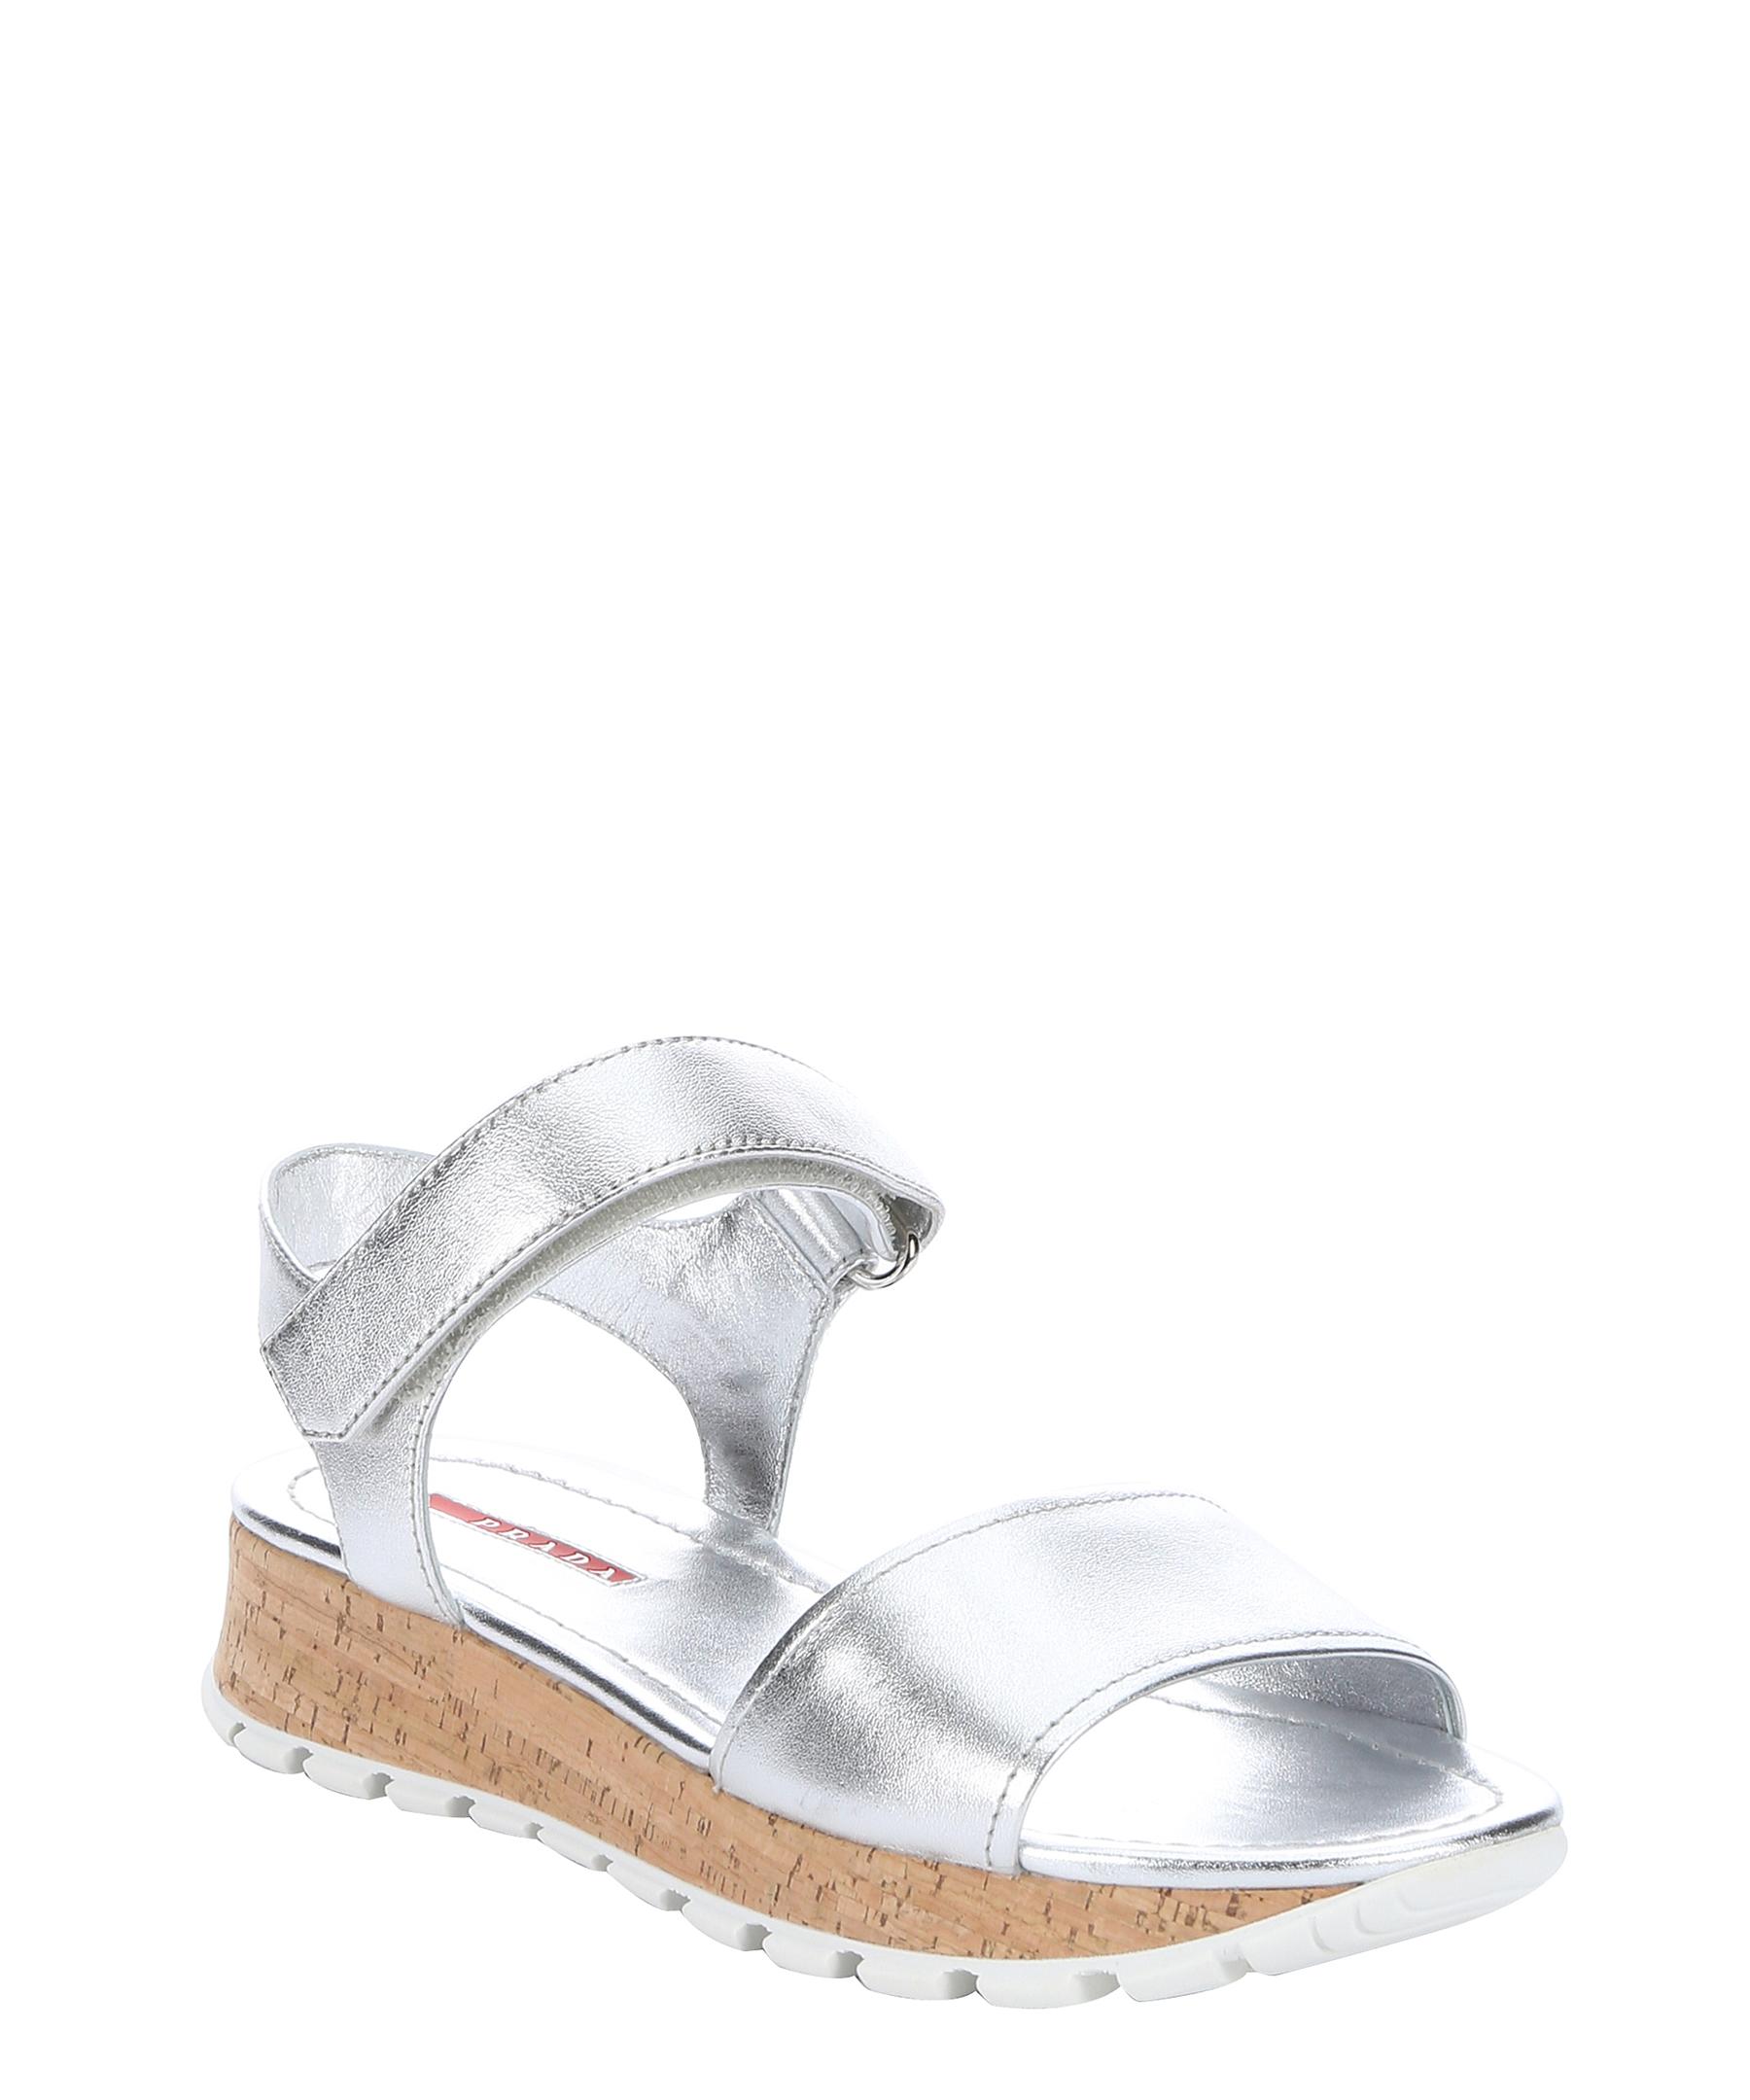 Prada Sport Silver Leather Cork Sandals In Metallic Lyst